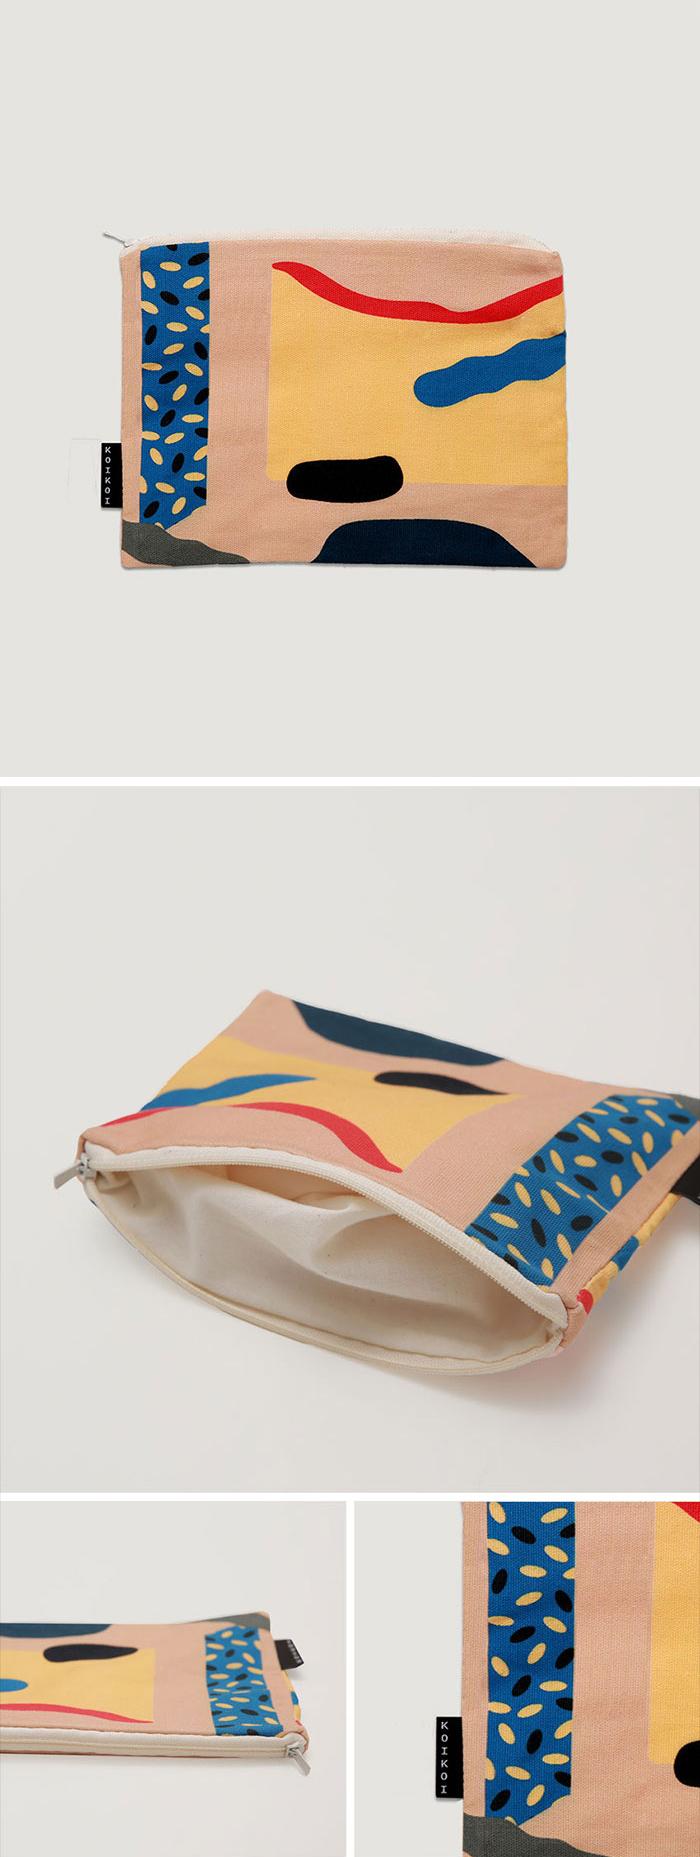 Cut outs small pouch - beige - 코이코이, 9,500원, 메이크업 파우치, 지퍼형